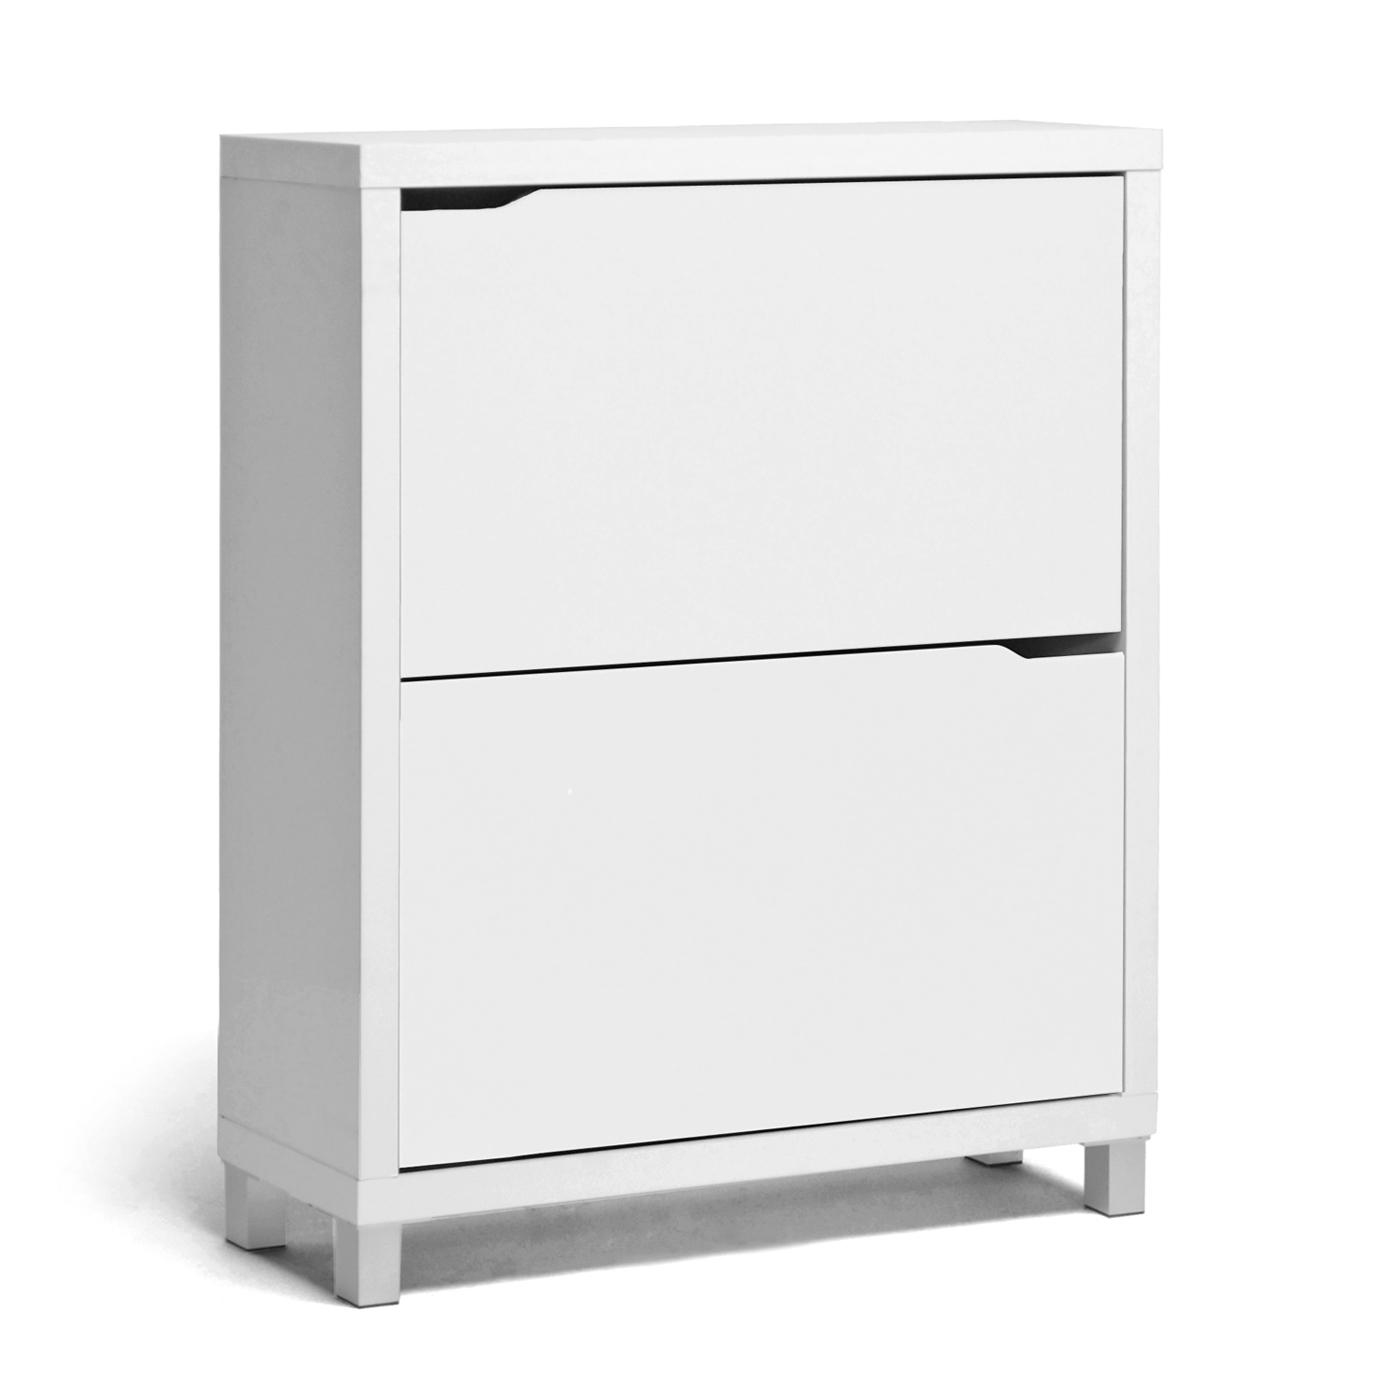 Captivating Baxton Studio Simms White Modern Shoe Cabinet